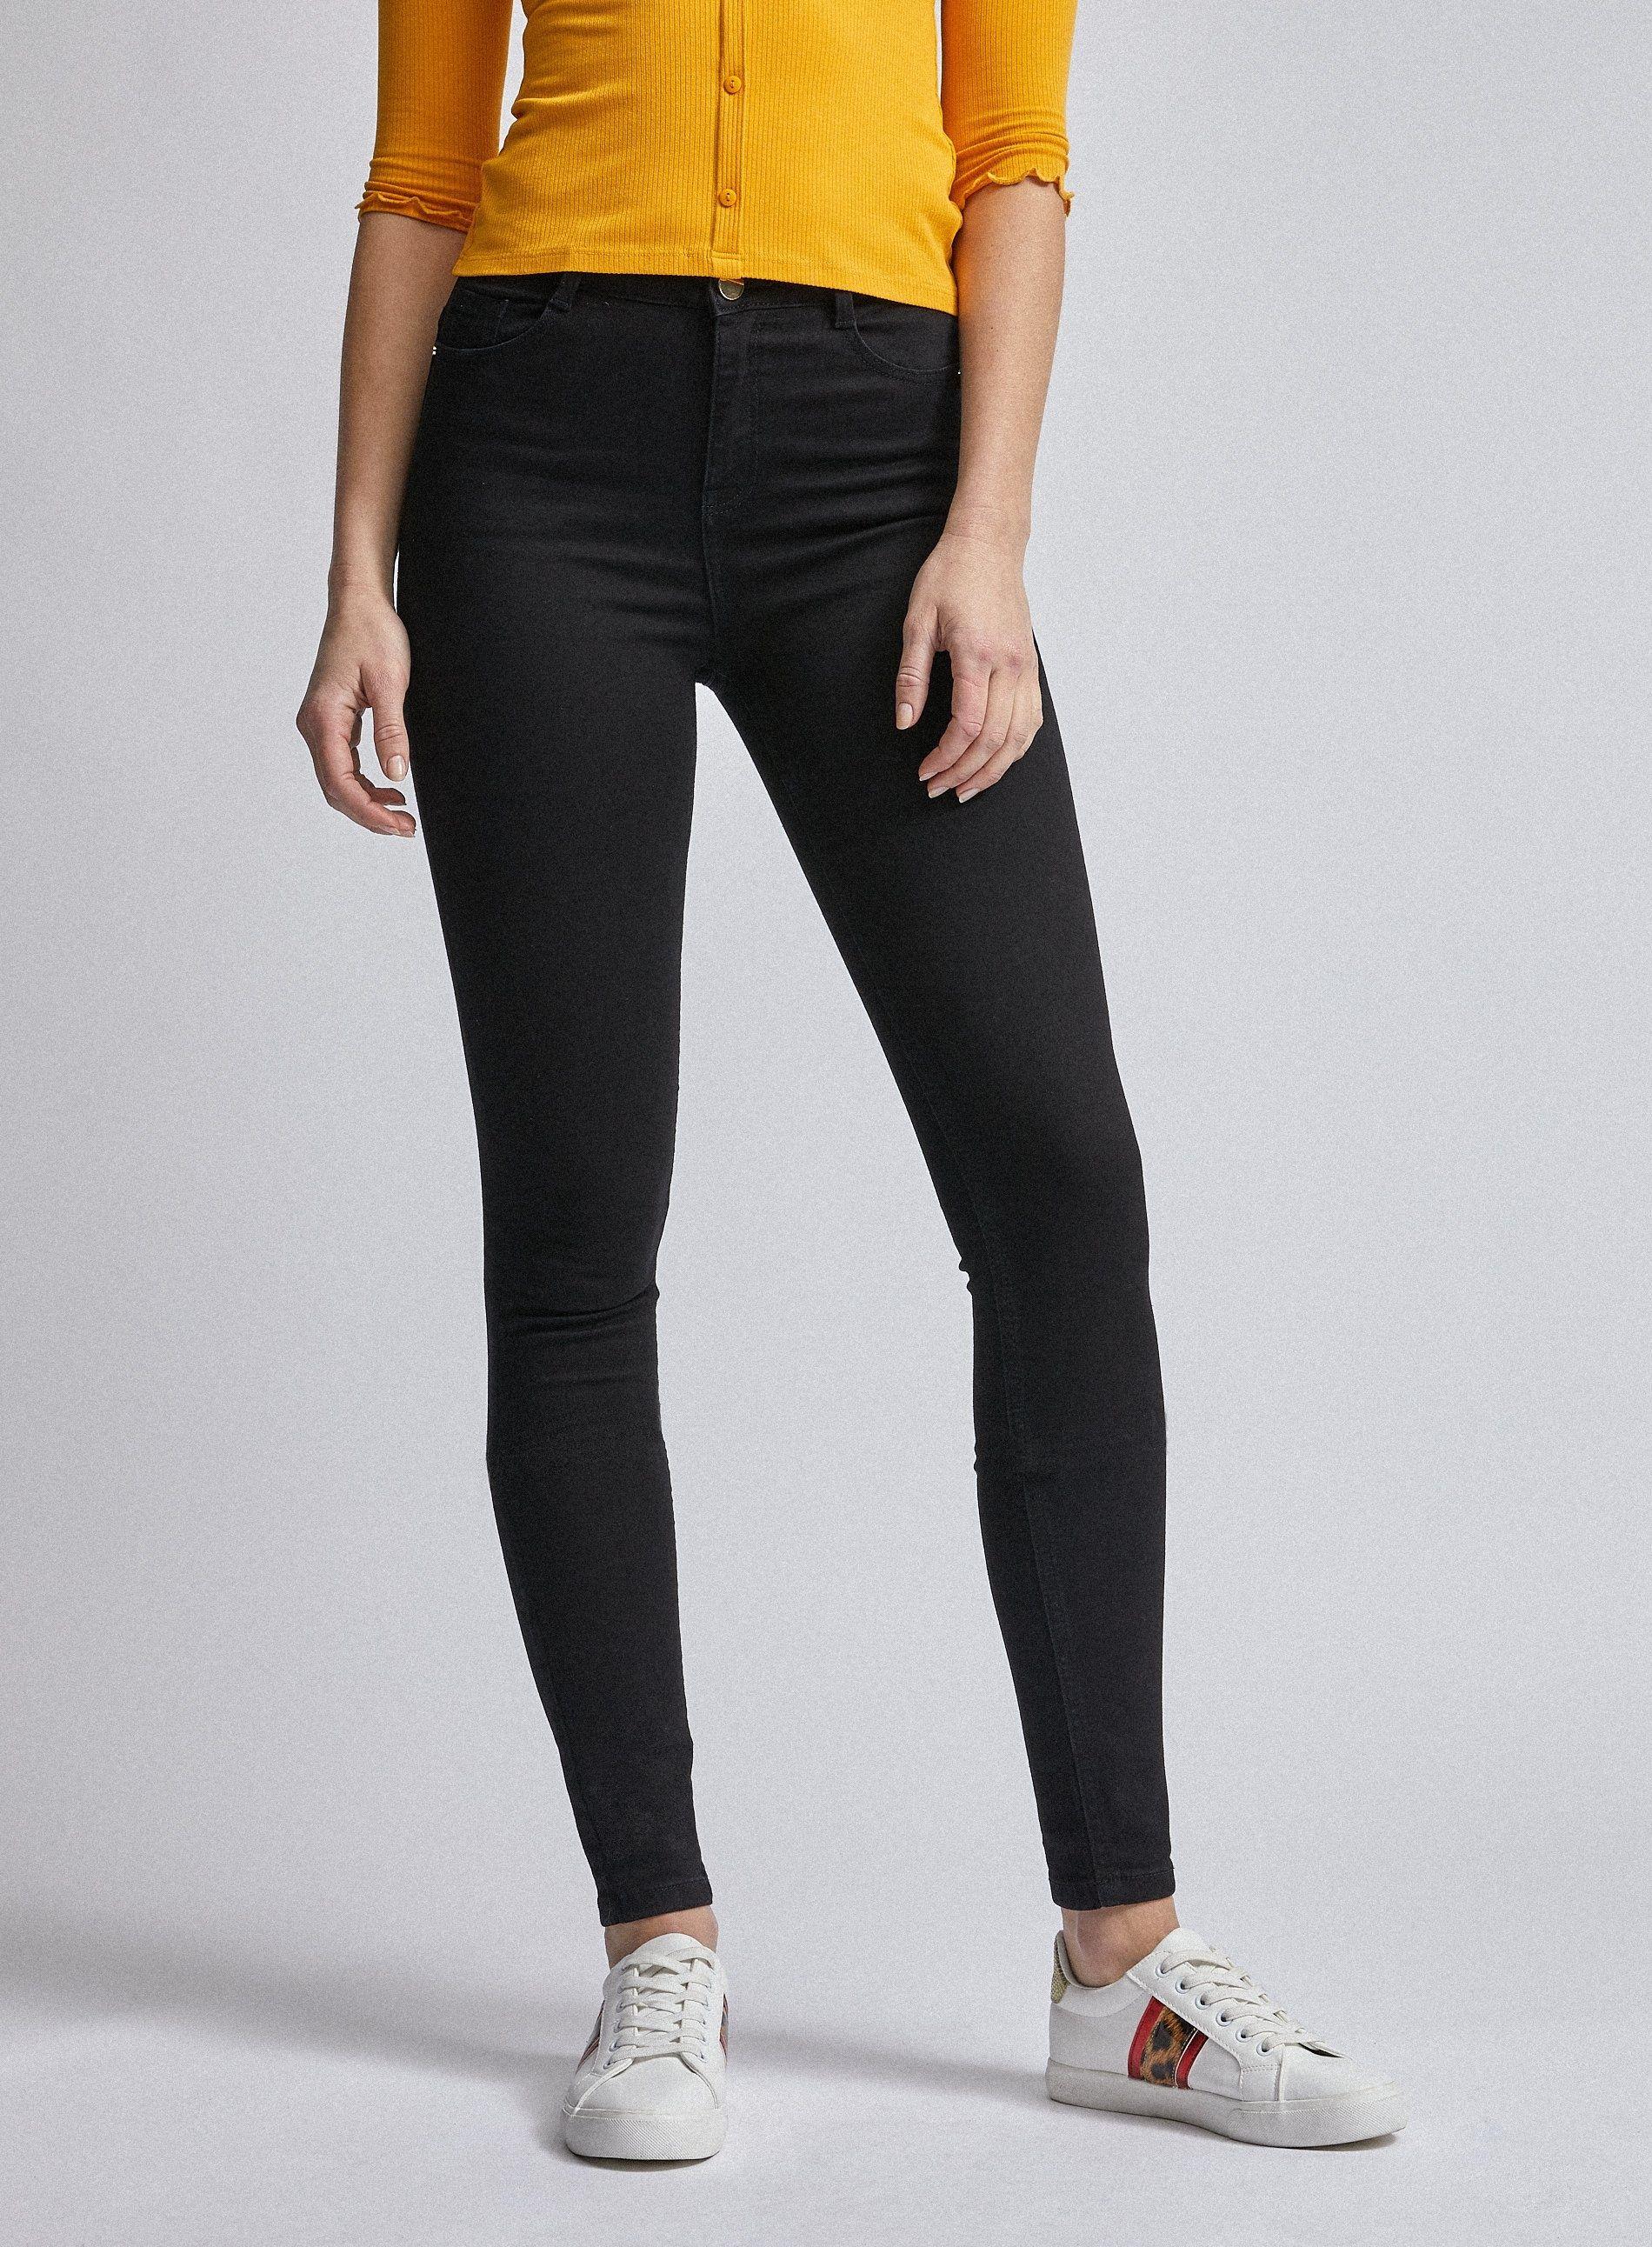 Dorothy Perkins Womens Tall Black Shape & Lift Shaping Skinny Jeans Trousers